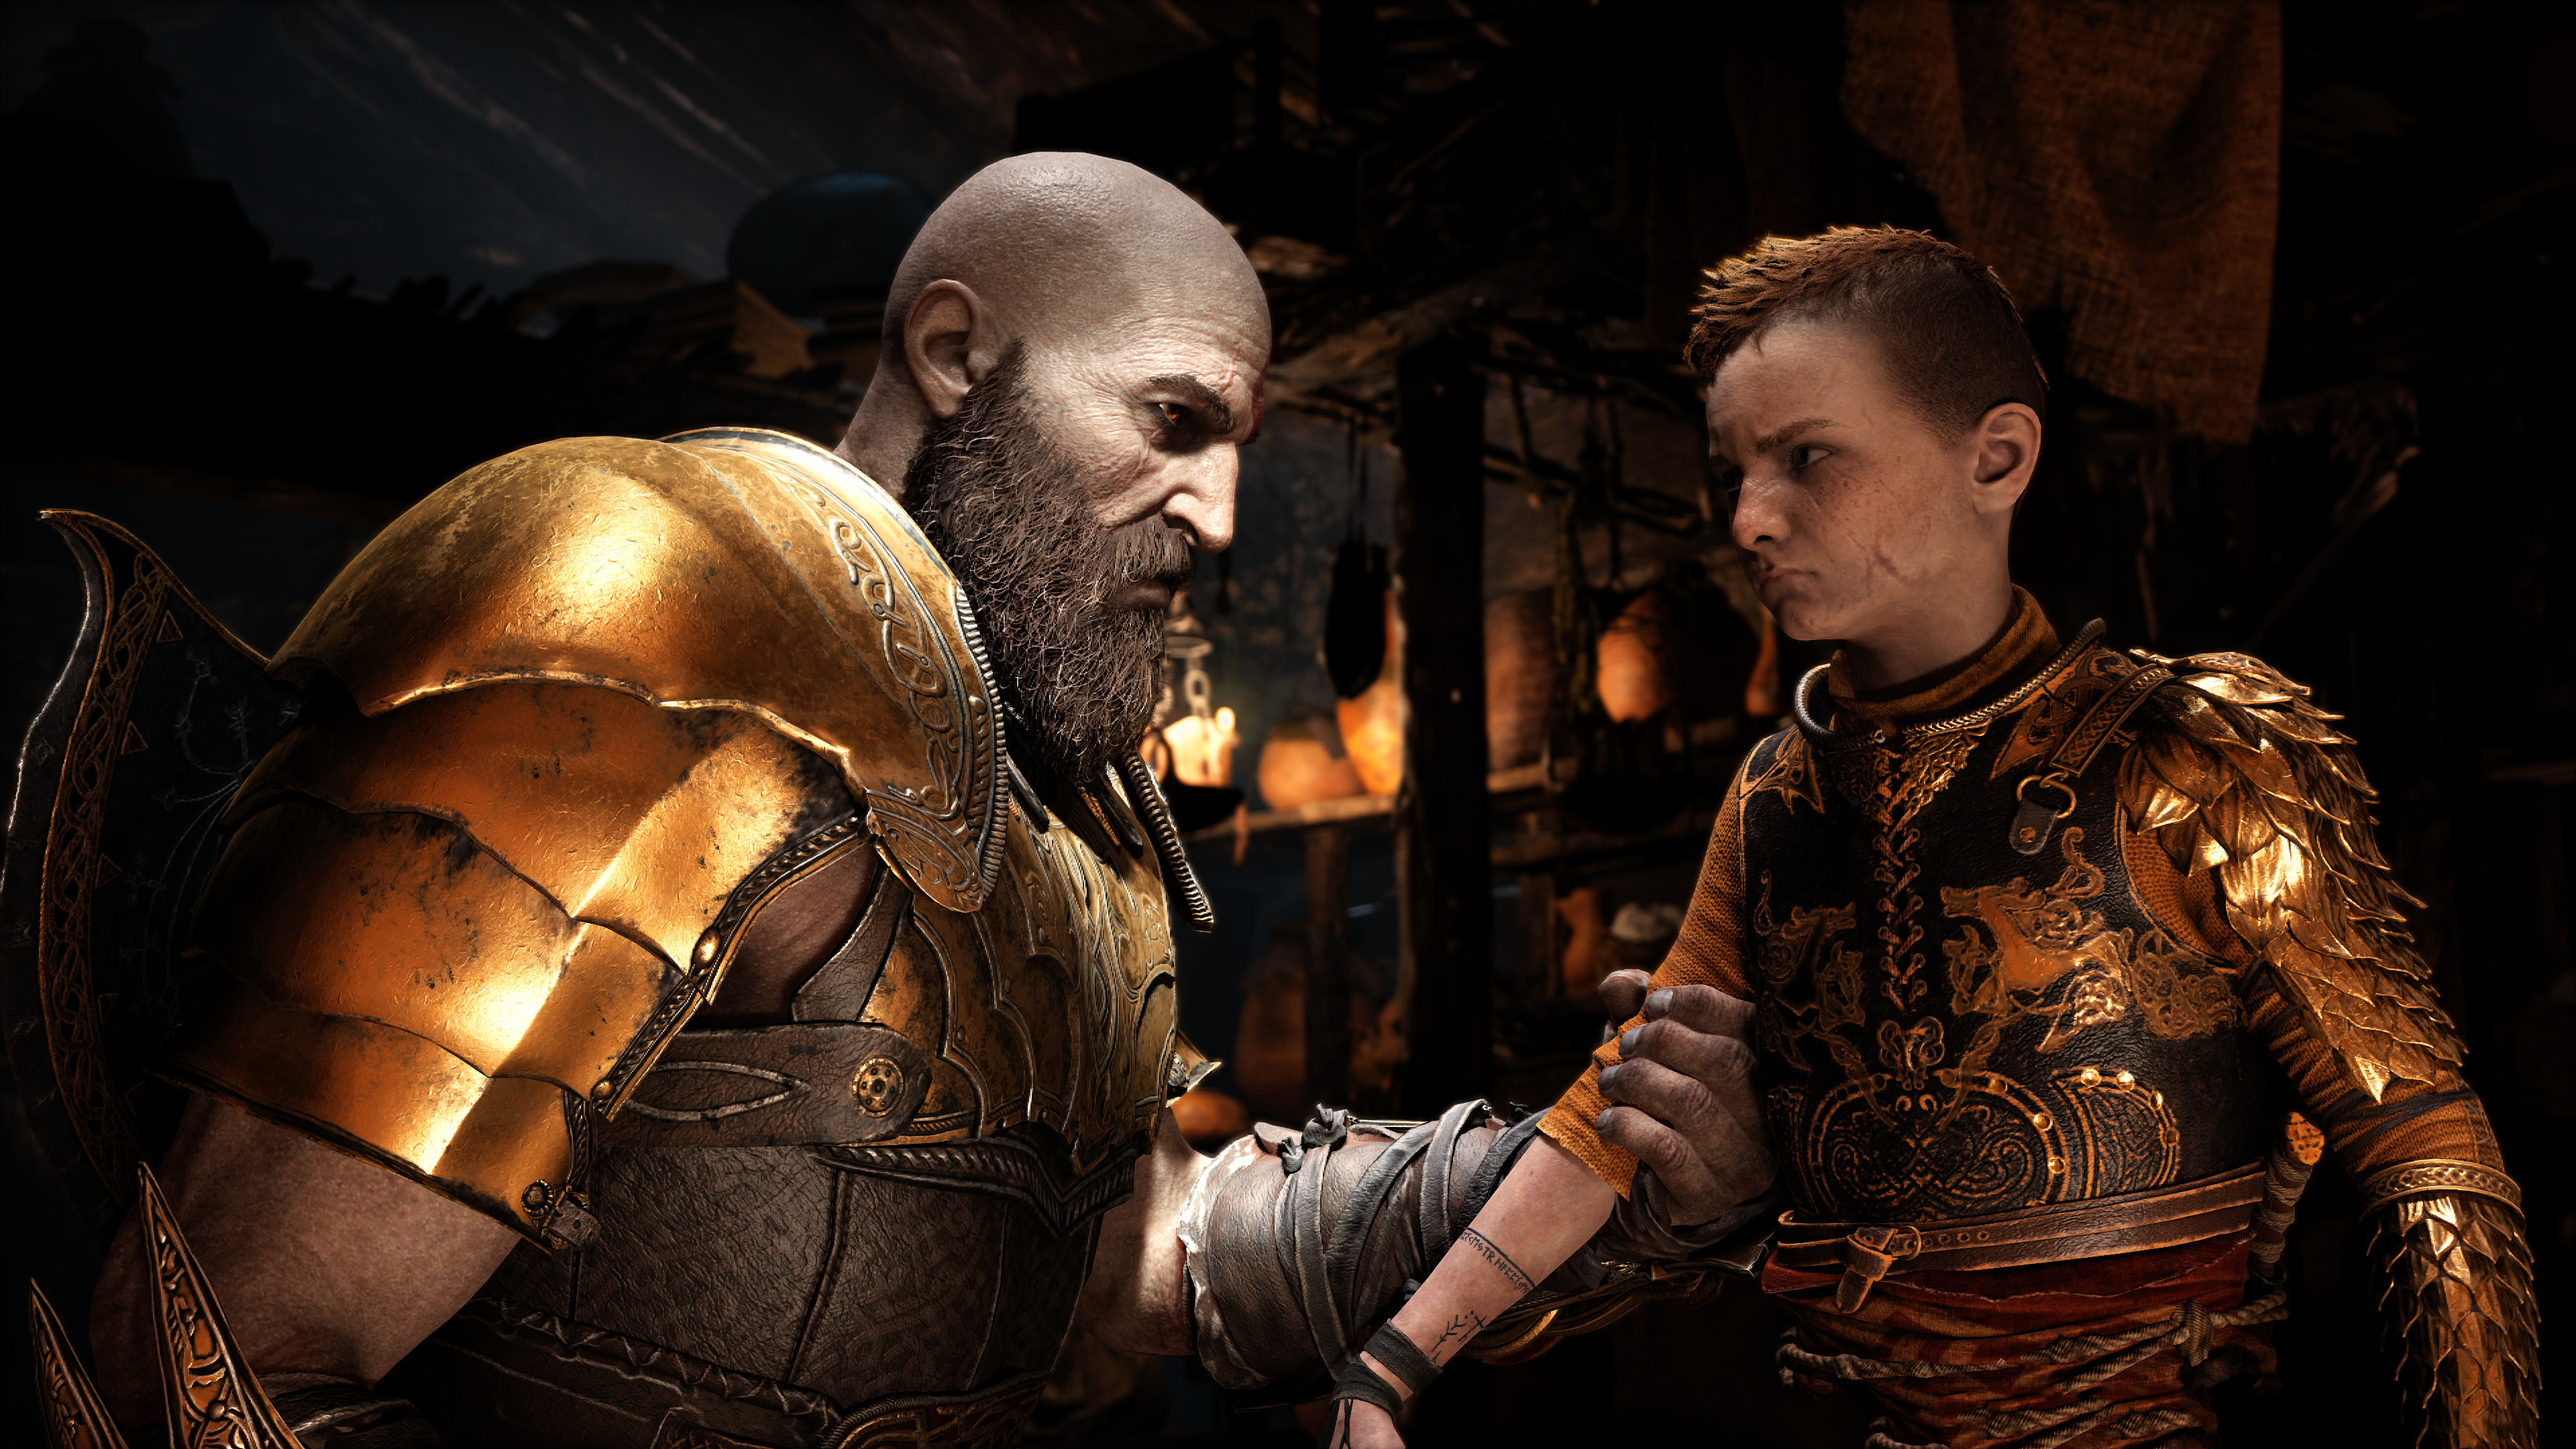 4k god of war 4 kratos and atreus hd games 4k wallpapers images backgrounds photos and pictures - Wallpaper kratos ...